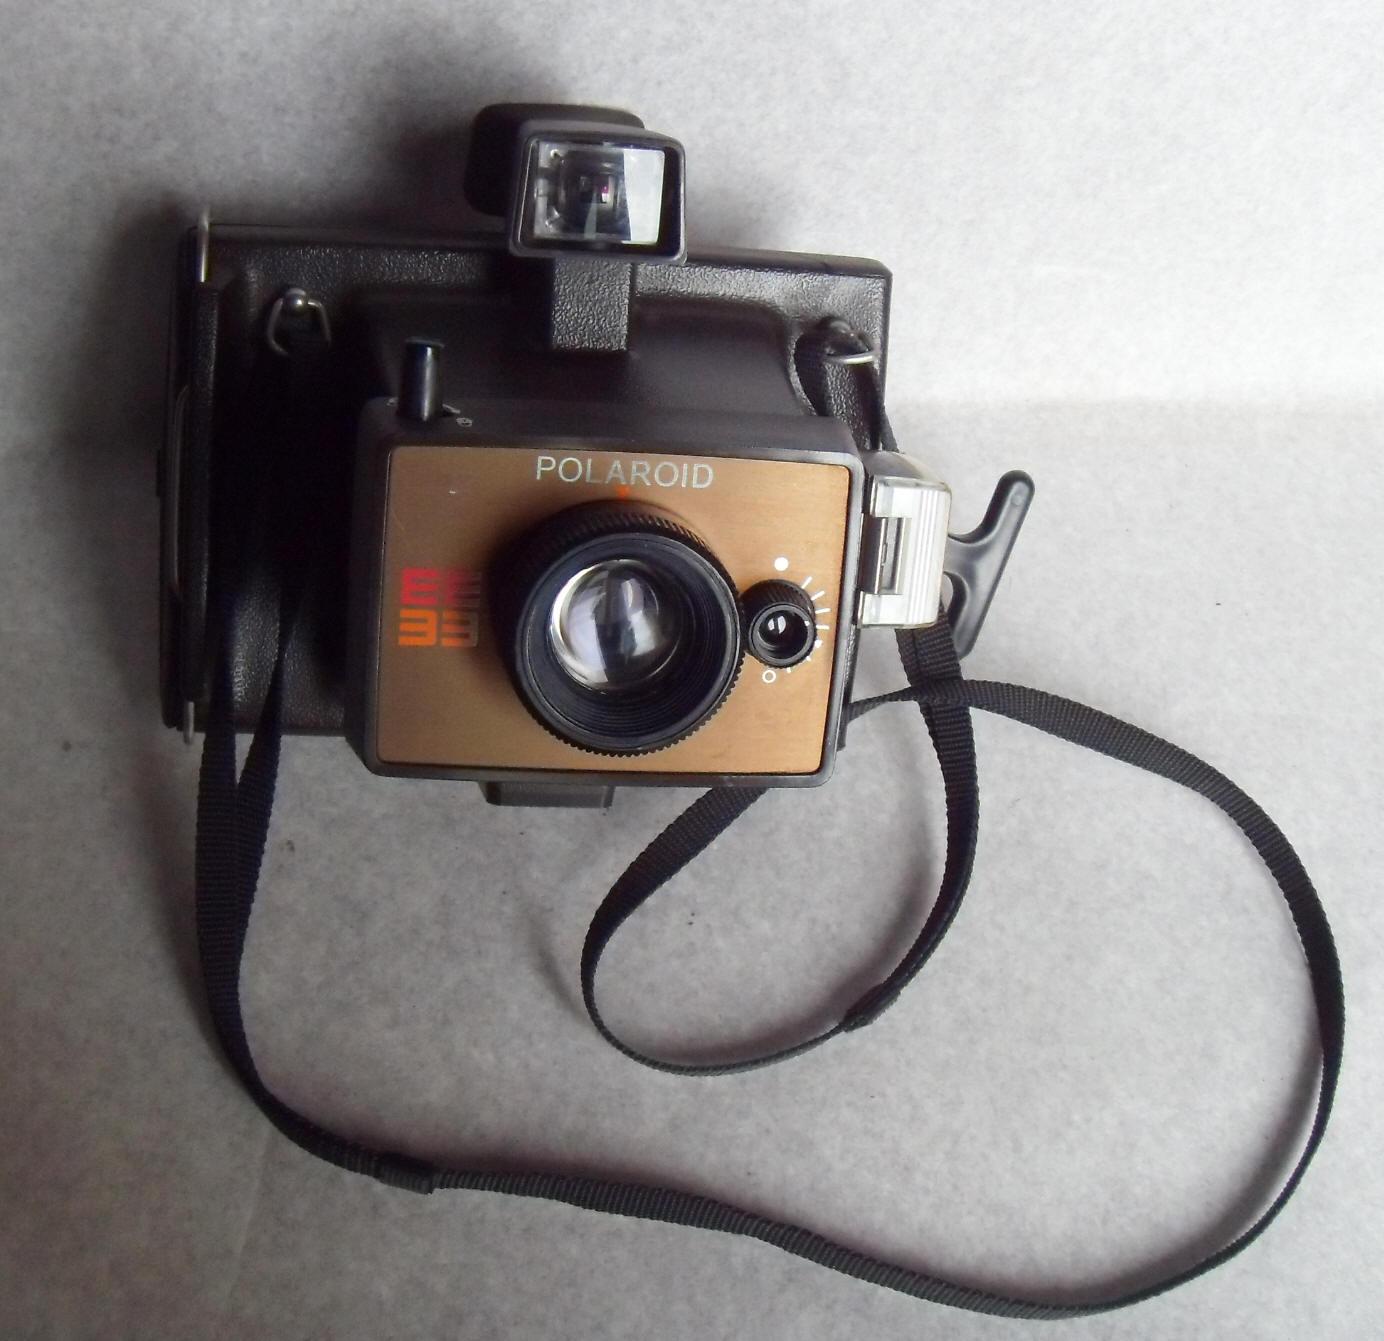 Appareil polaroid ee33 pour pack 80 il est ok vers 1975 ebay - Point relais luxembourg ...